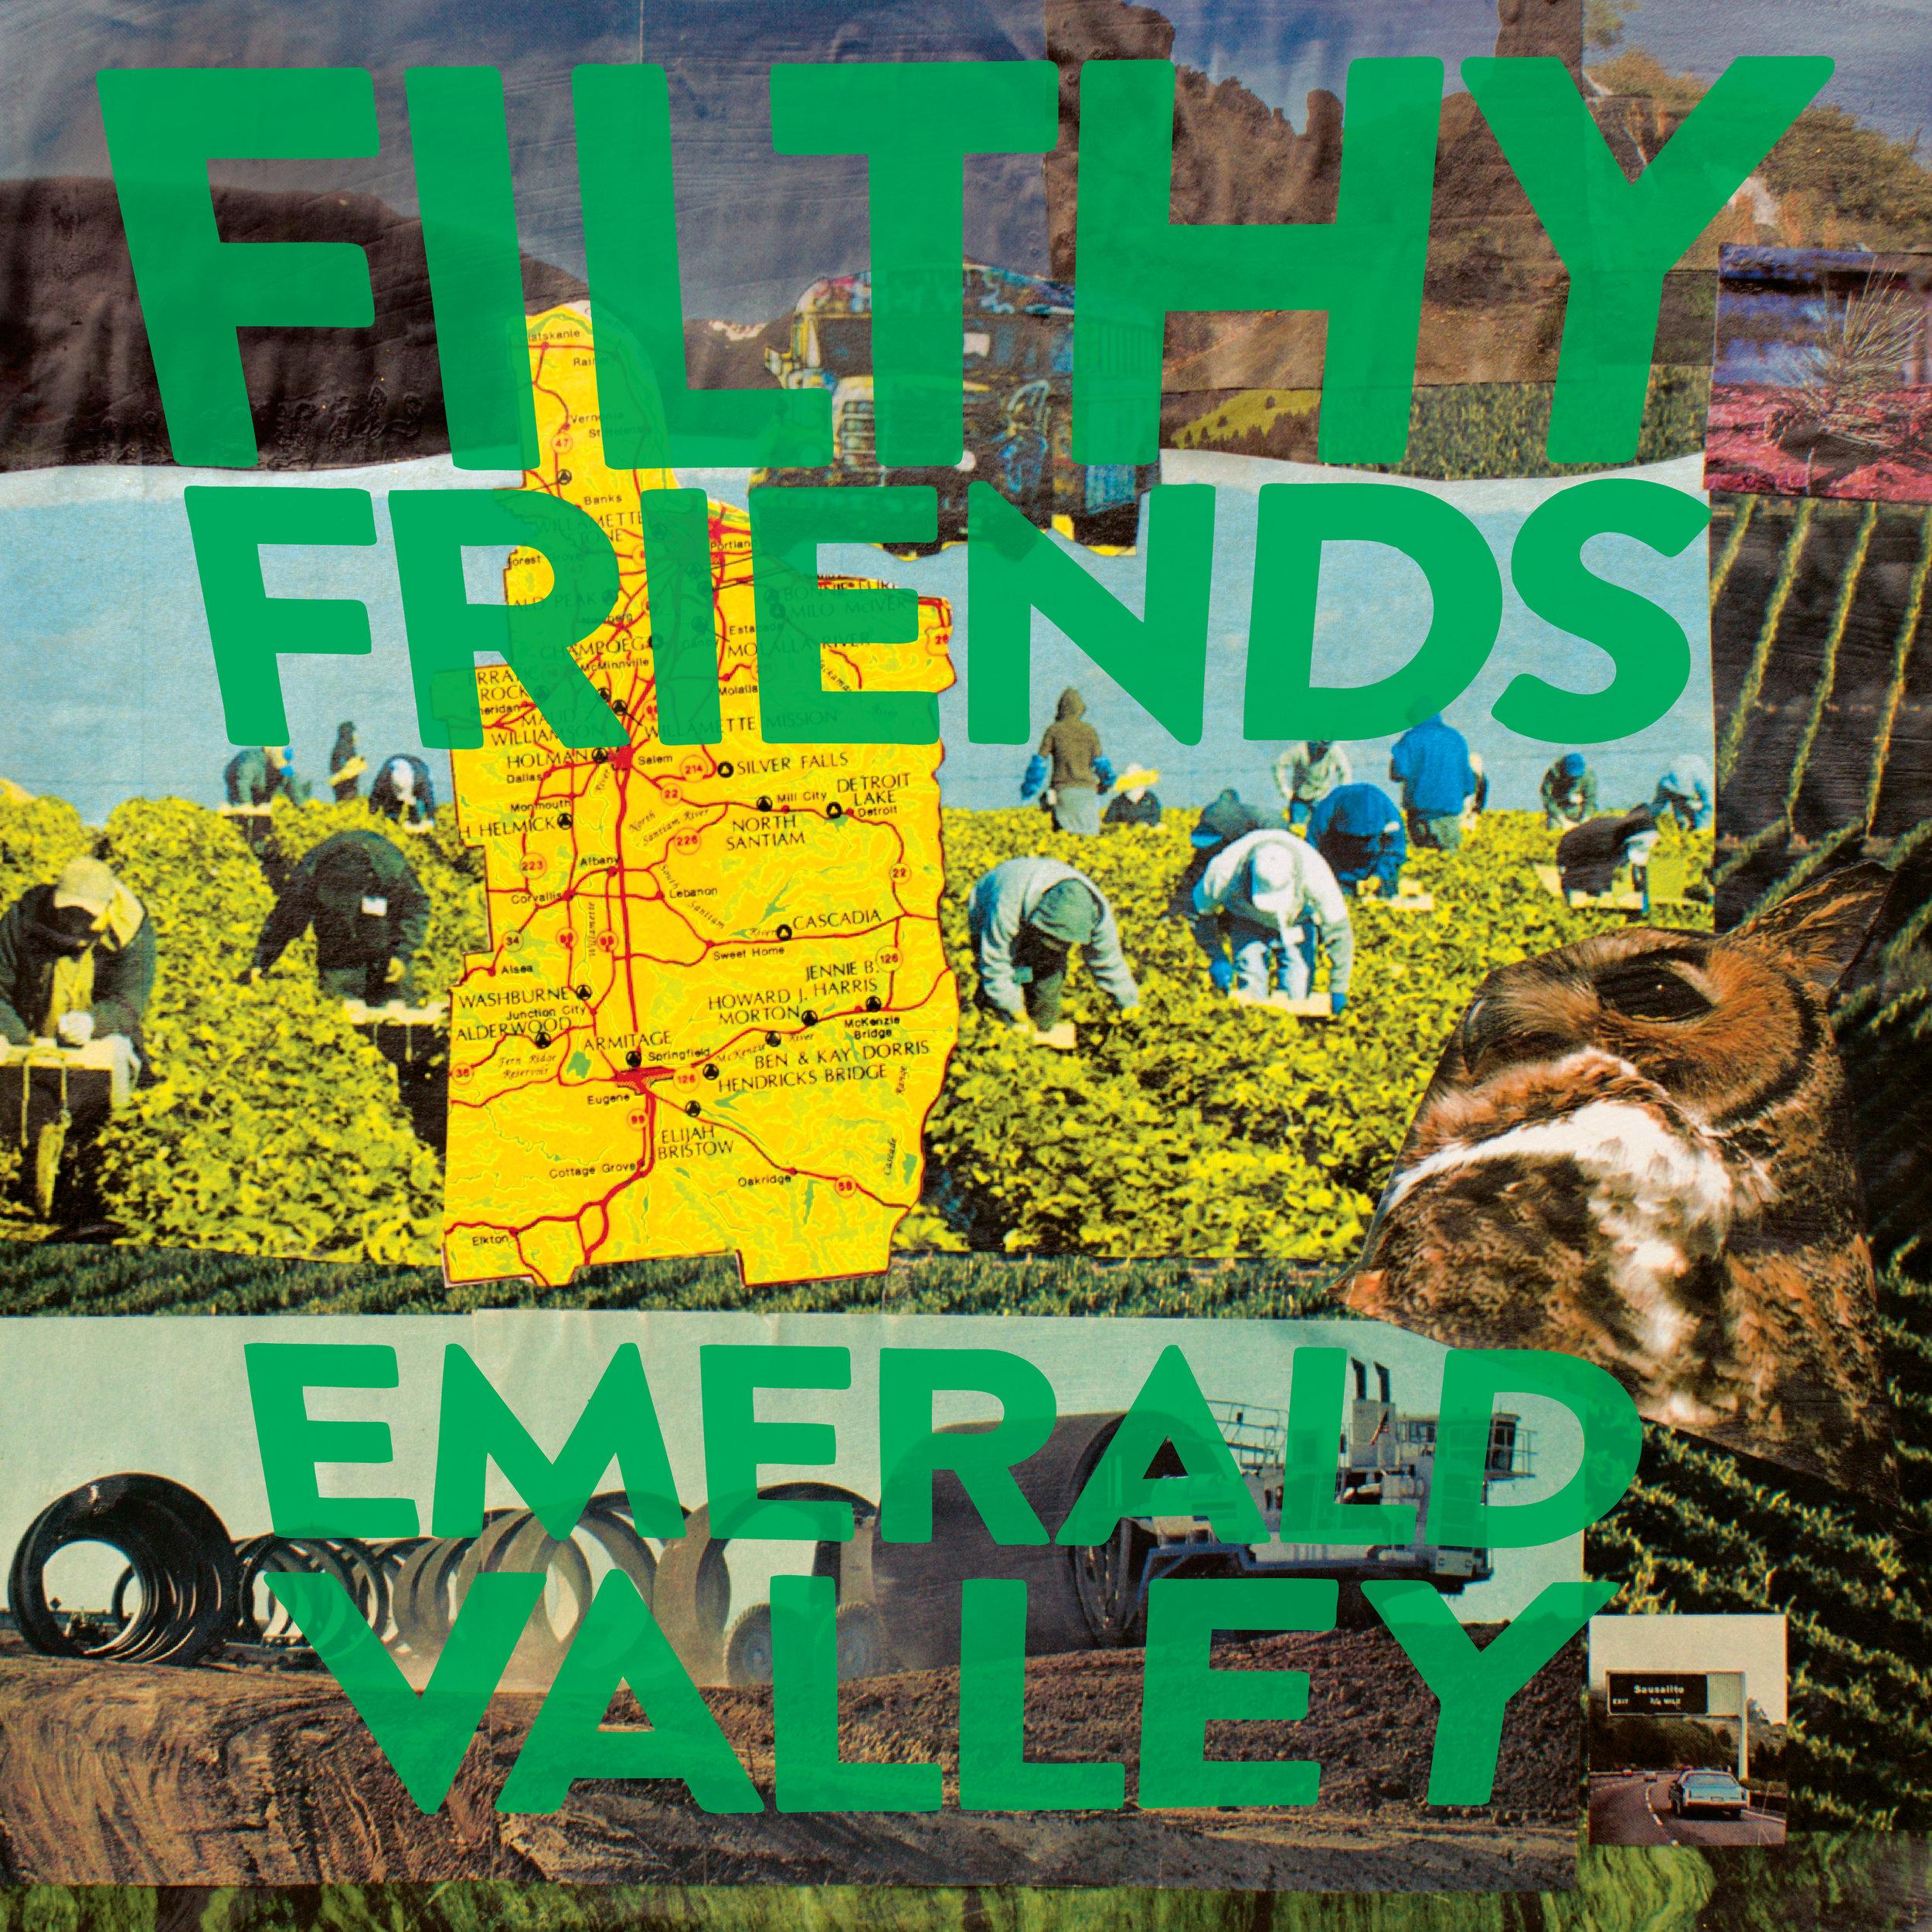 Filthy Friends - Filthy Friends - Emerald Valley - Artwork - Hi-Res.jpg